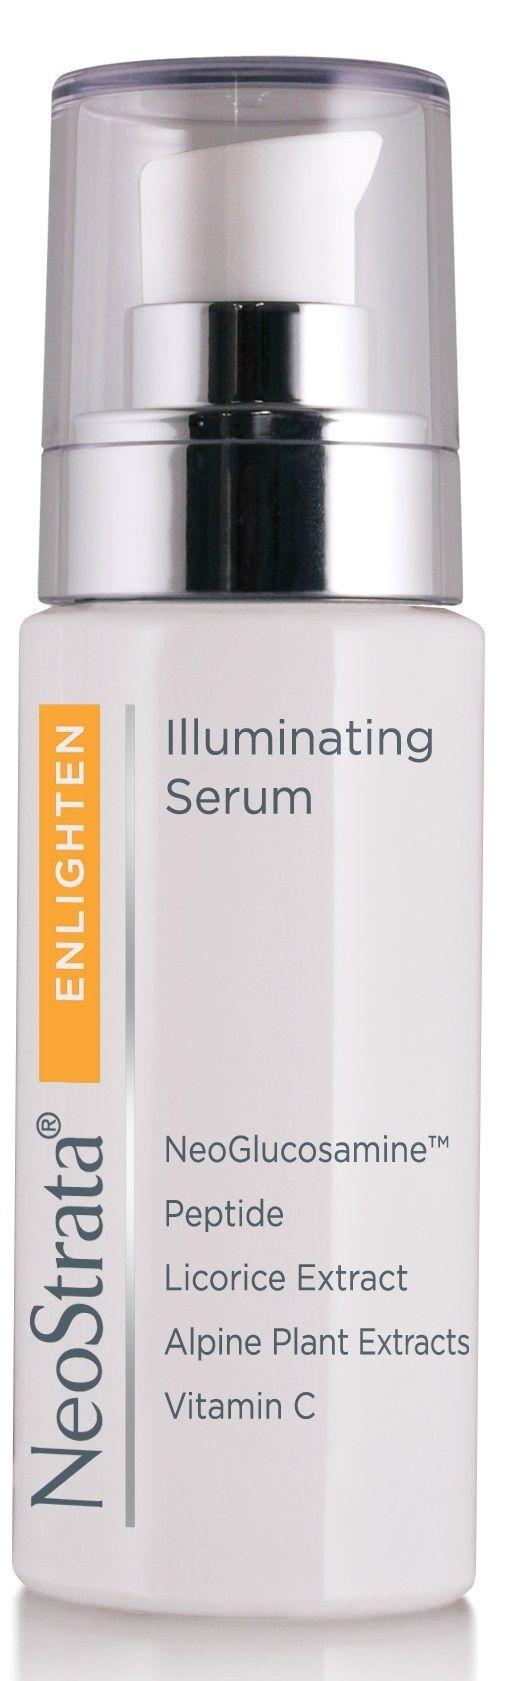 NeoStrata Enlighten Illuminating Serum 30 ml.